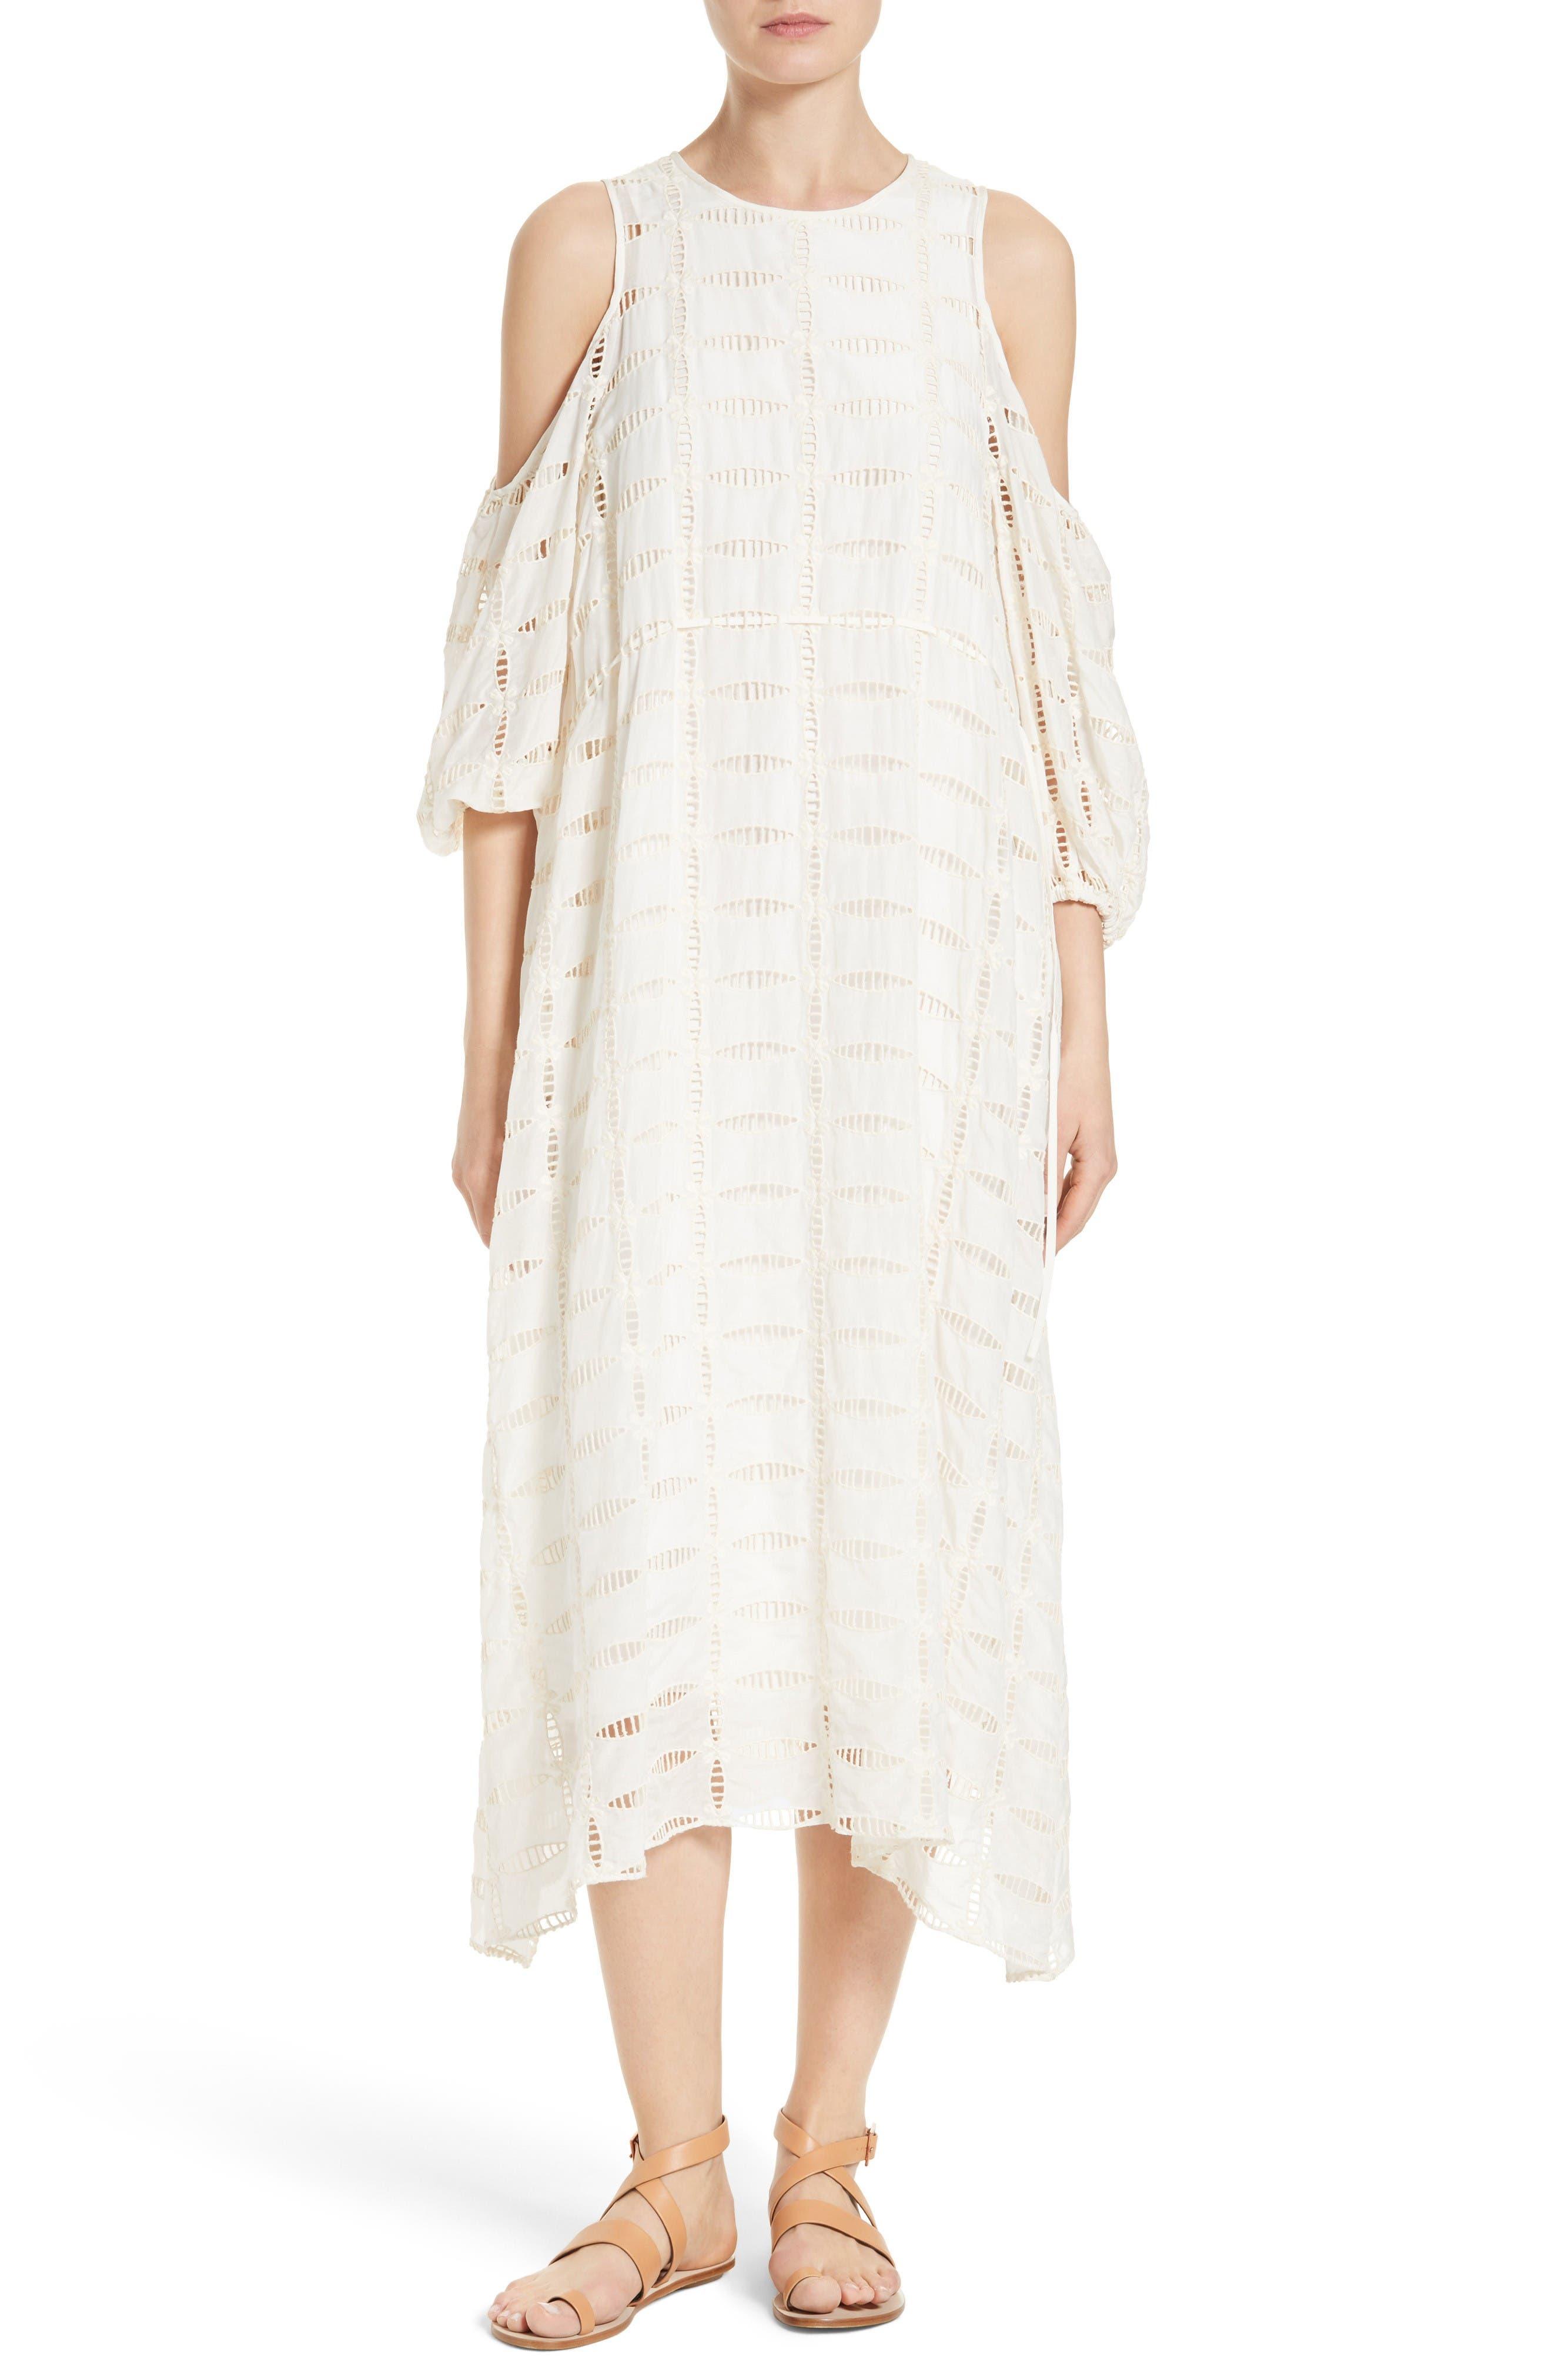 Alternate Image 1 Selected - Tibi Luca Cold Shoulder Eyelet Midi Dress